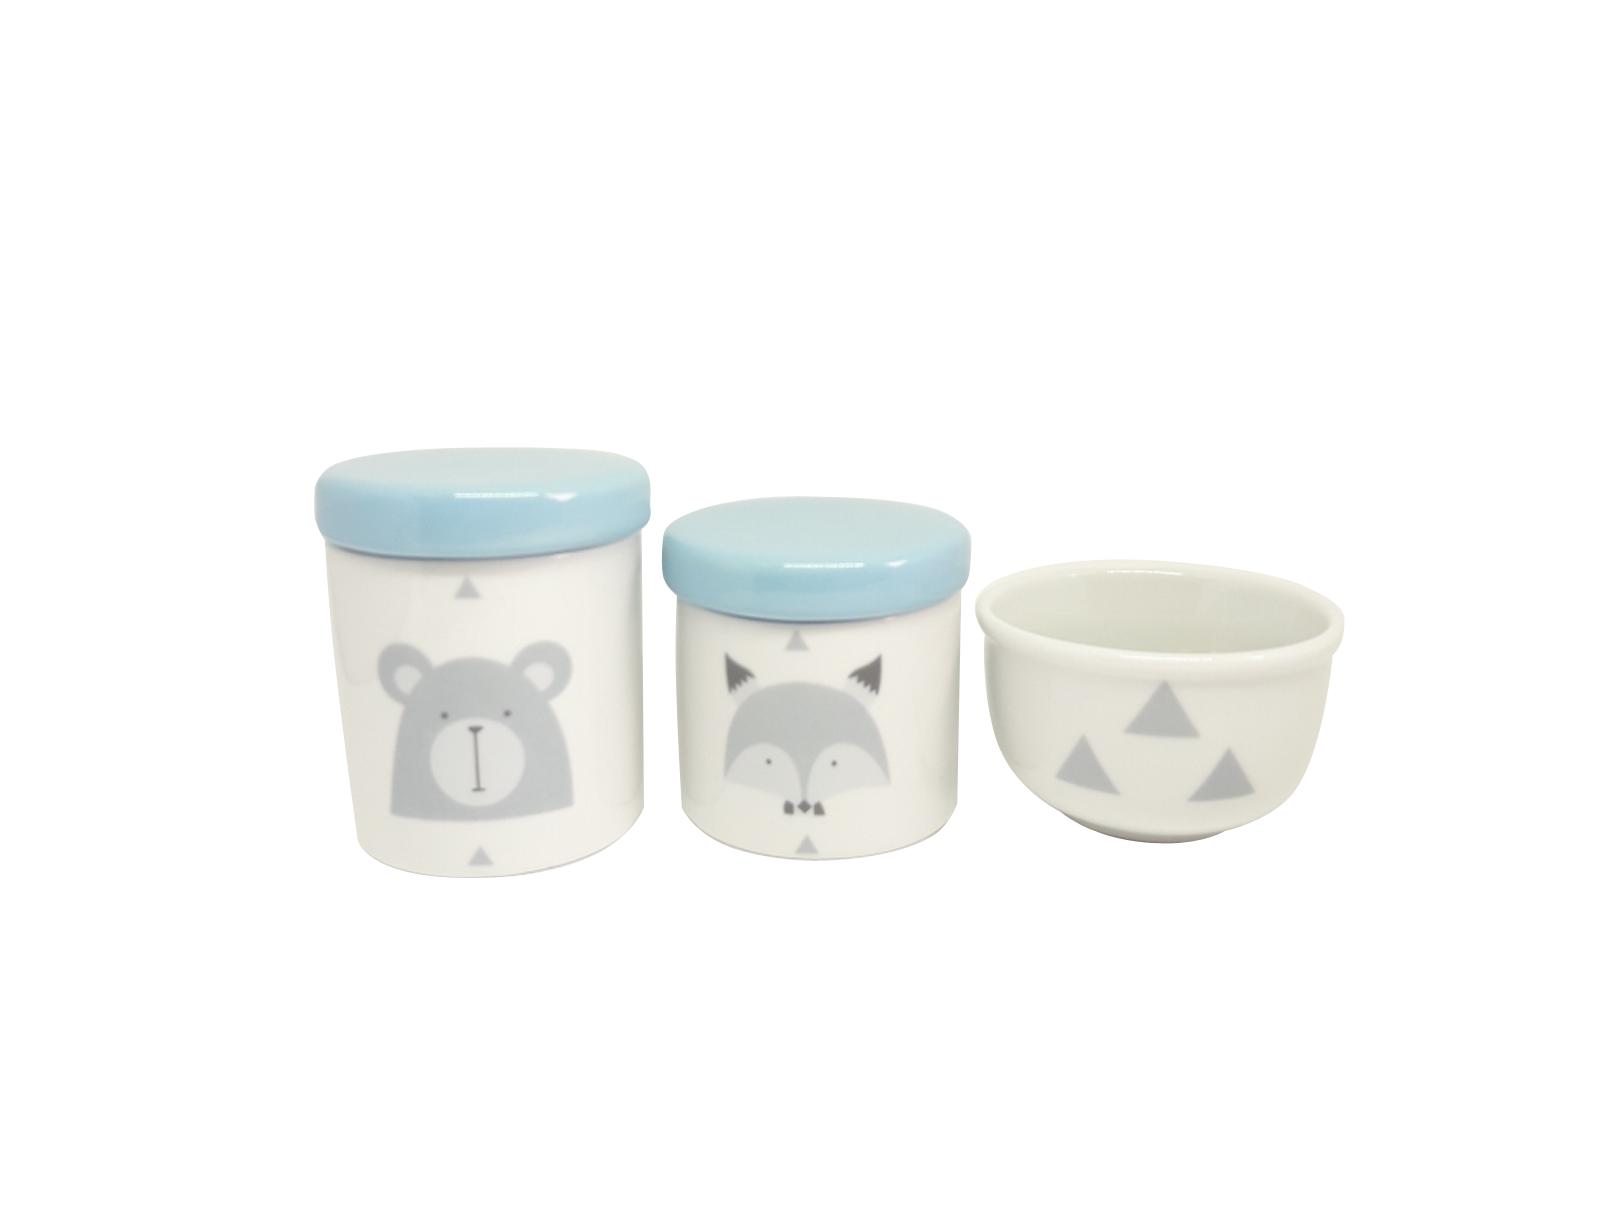 Kit Higiene Bebê Porcelana Escandinavo |Urso e Raposa | Geométrico | Tampa Azul